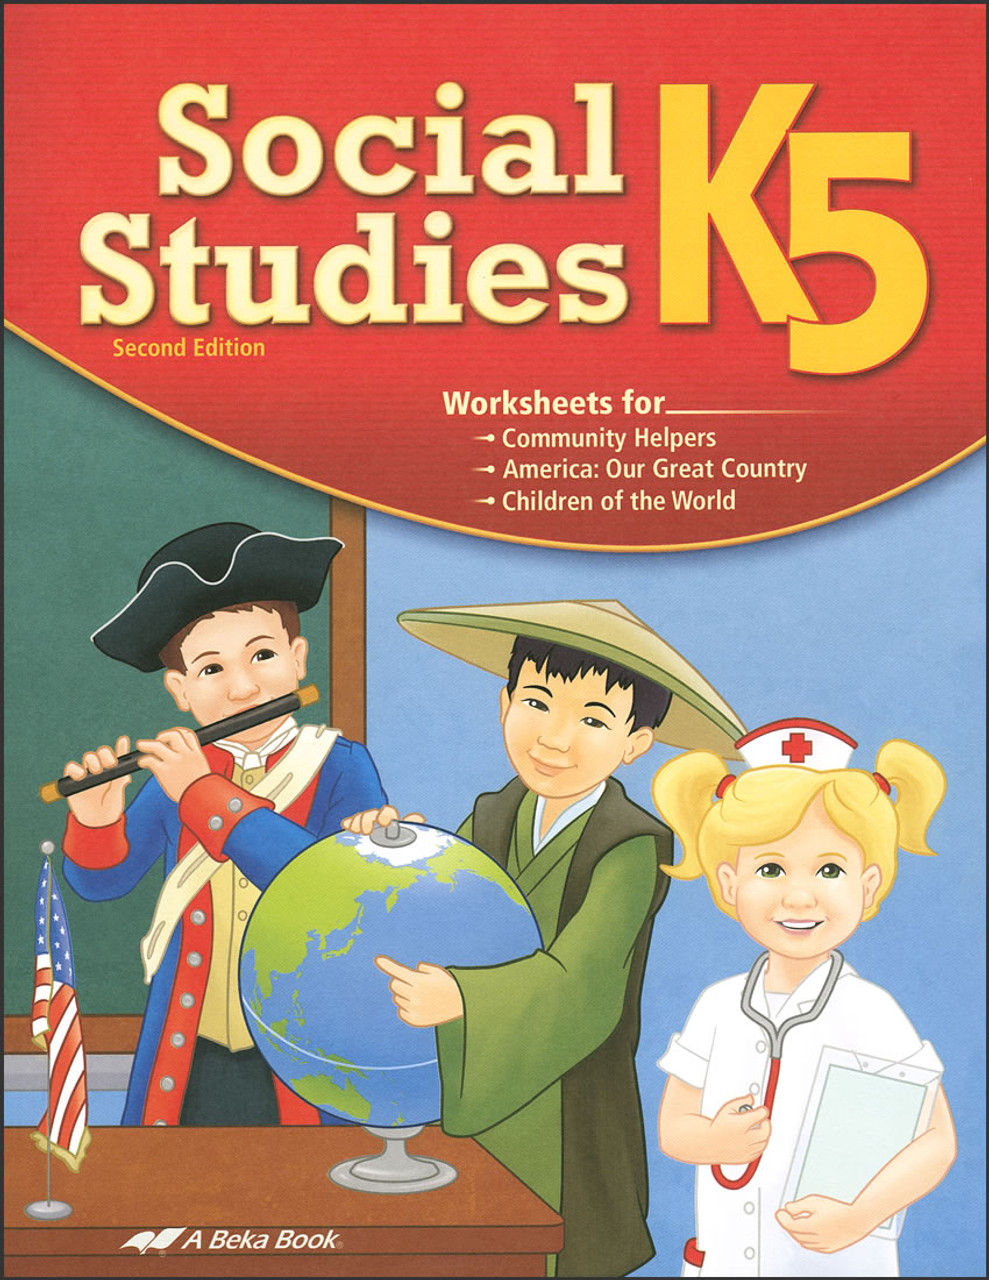 Social Studies K5, 2nd edition